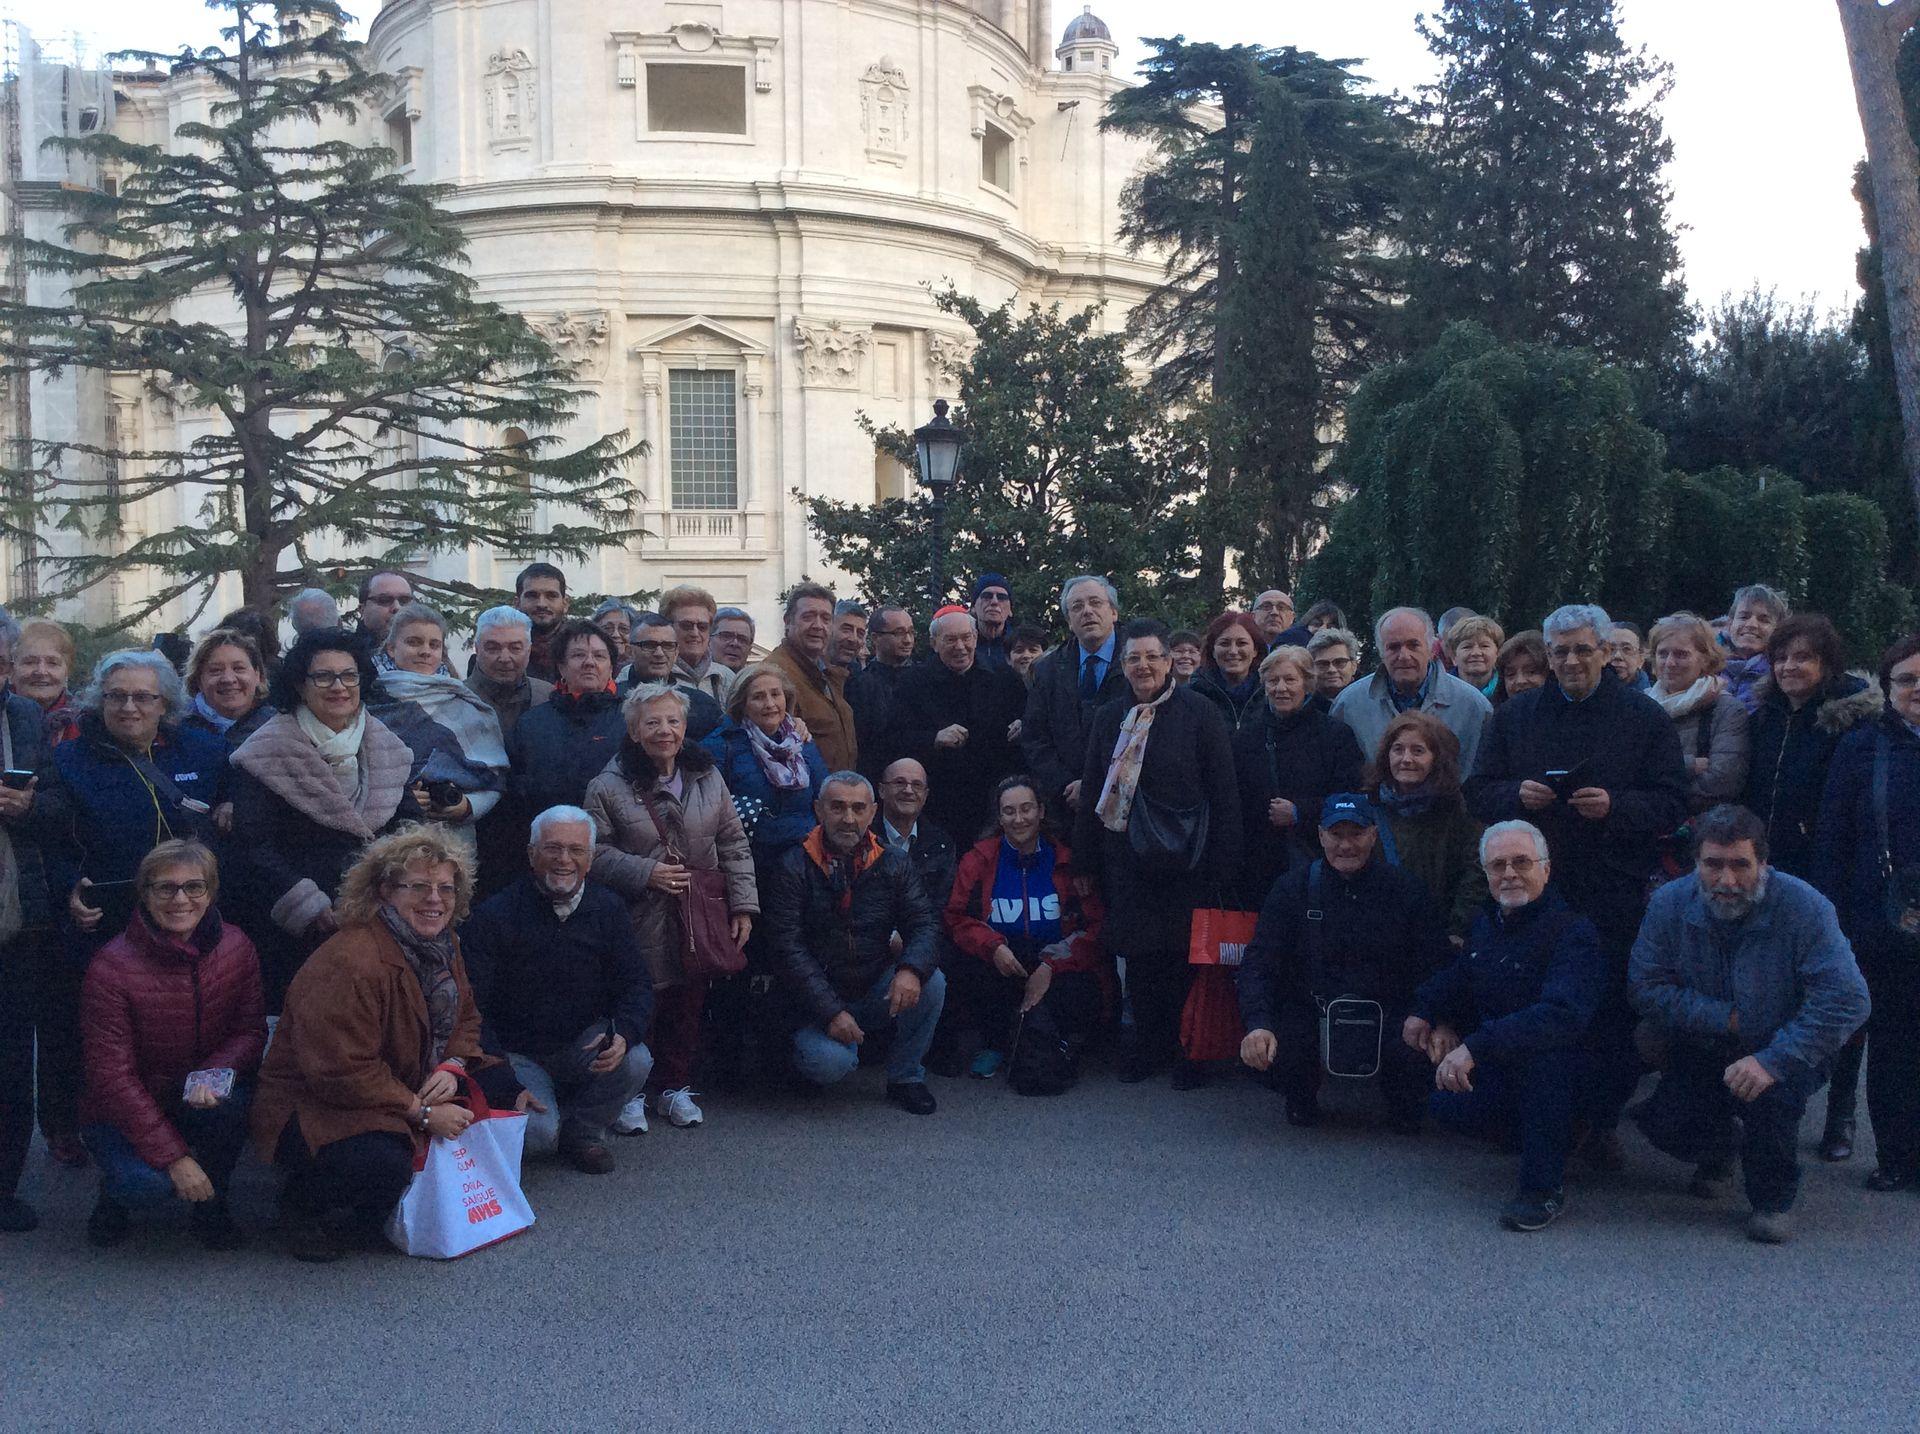 La Guida - Avis del Piemonte in udienza da Papa Francesco